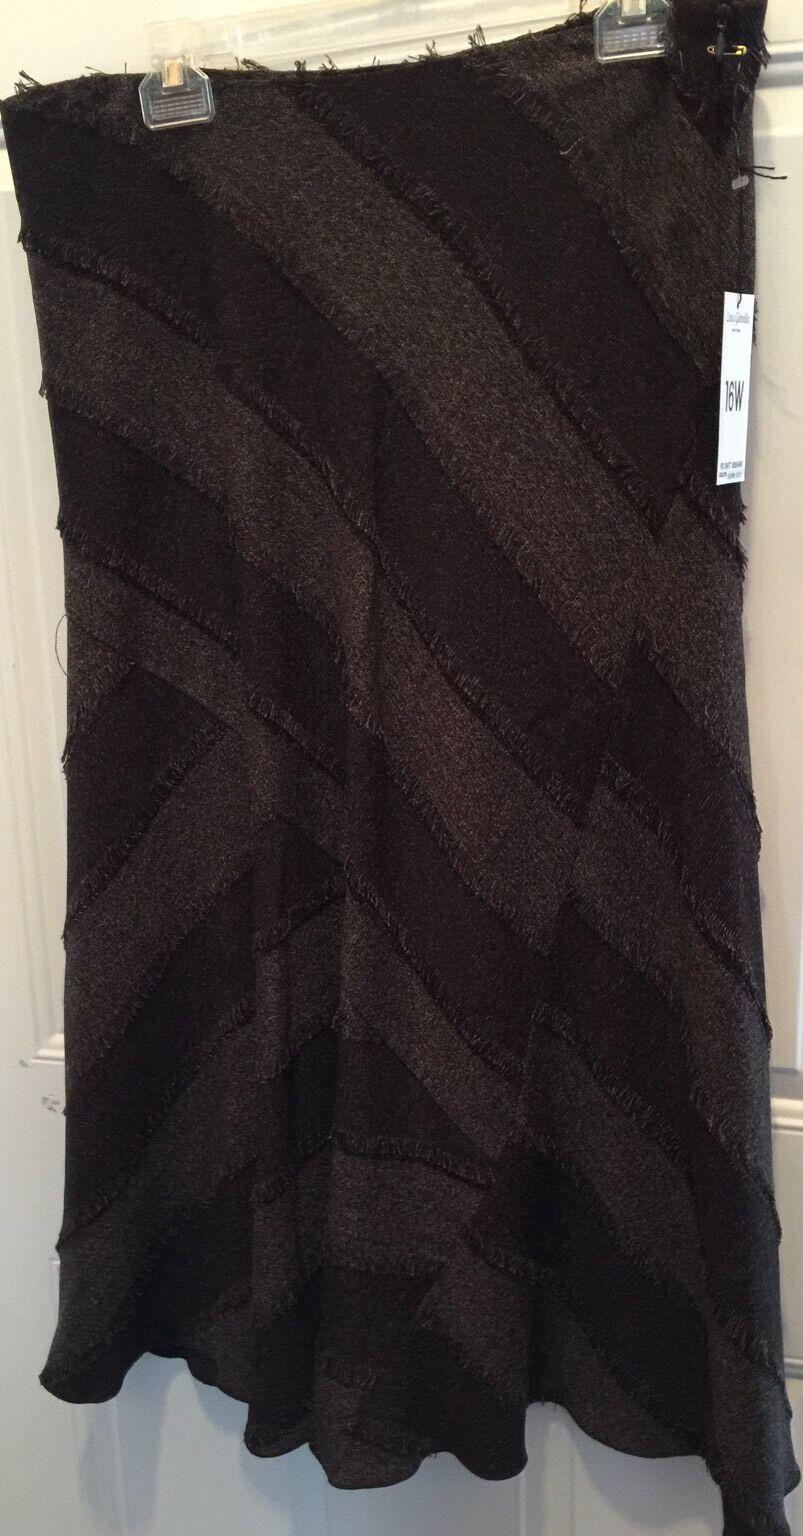 LENA GABRIELLE Size 16 Brown Skirt Striped Fringe Trim Fall NWT retail